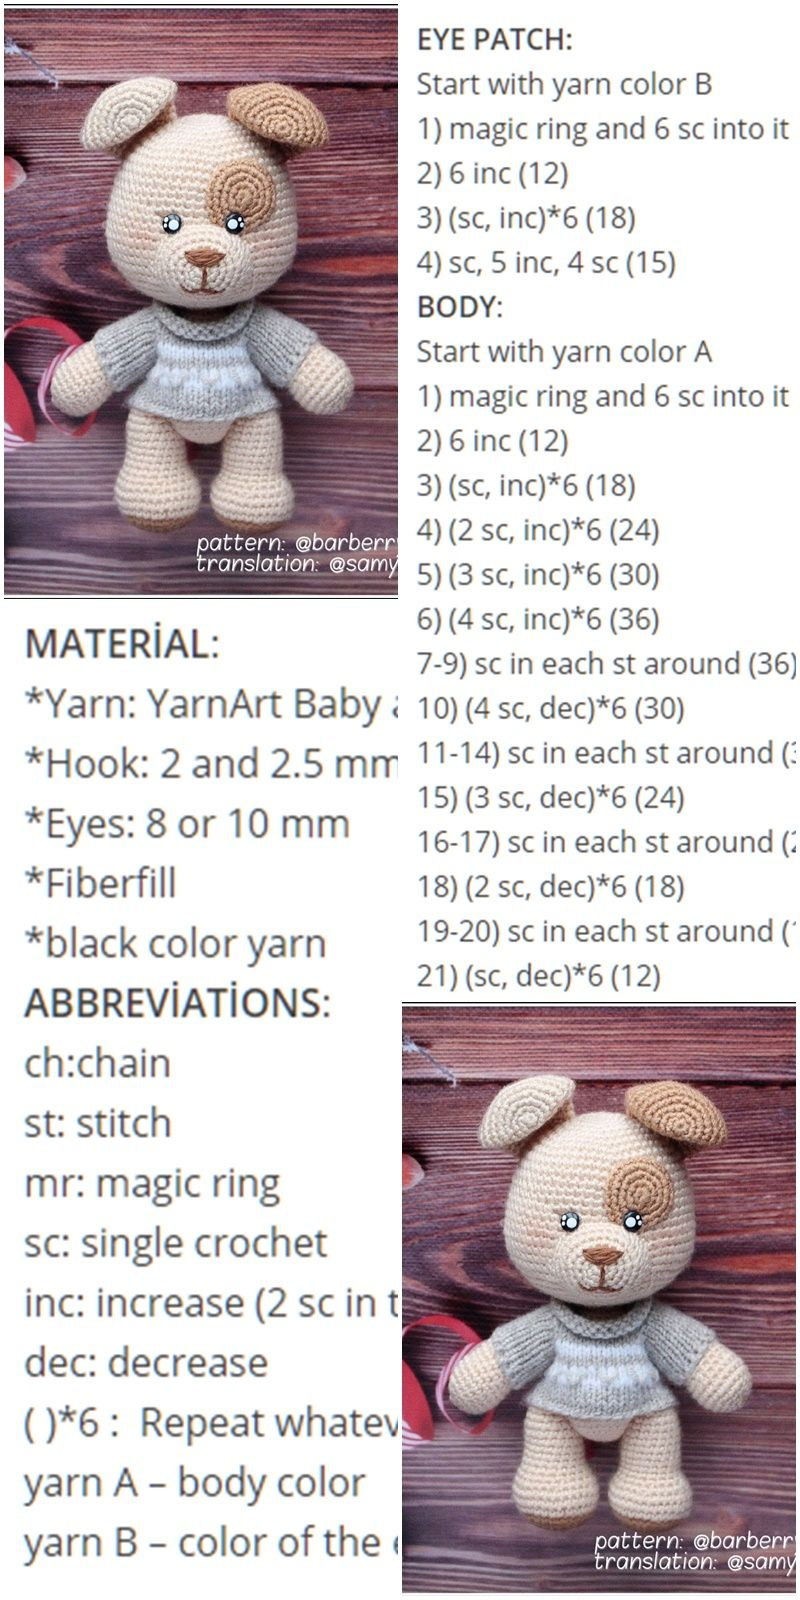 25 Free Amigurumi Dog Crochet Patterns to Download Now! | 1600x800